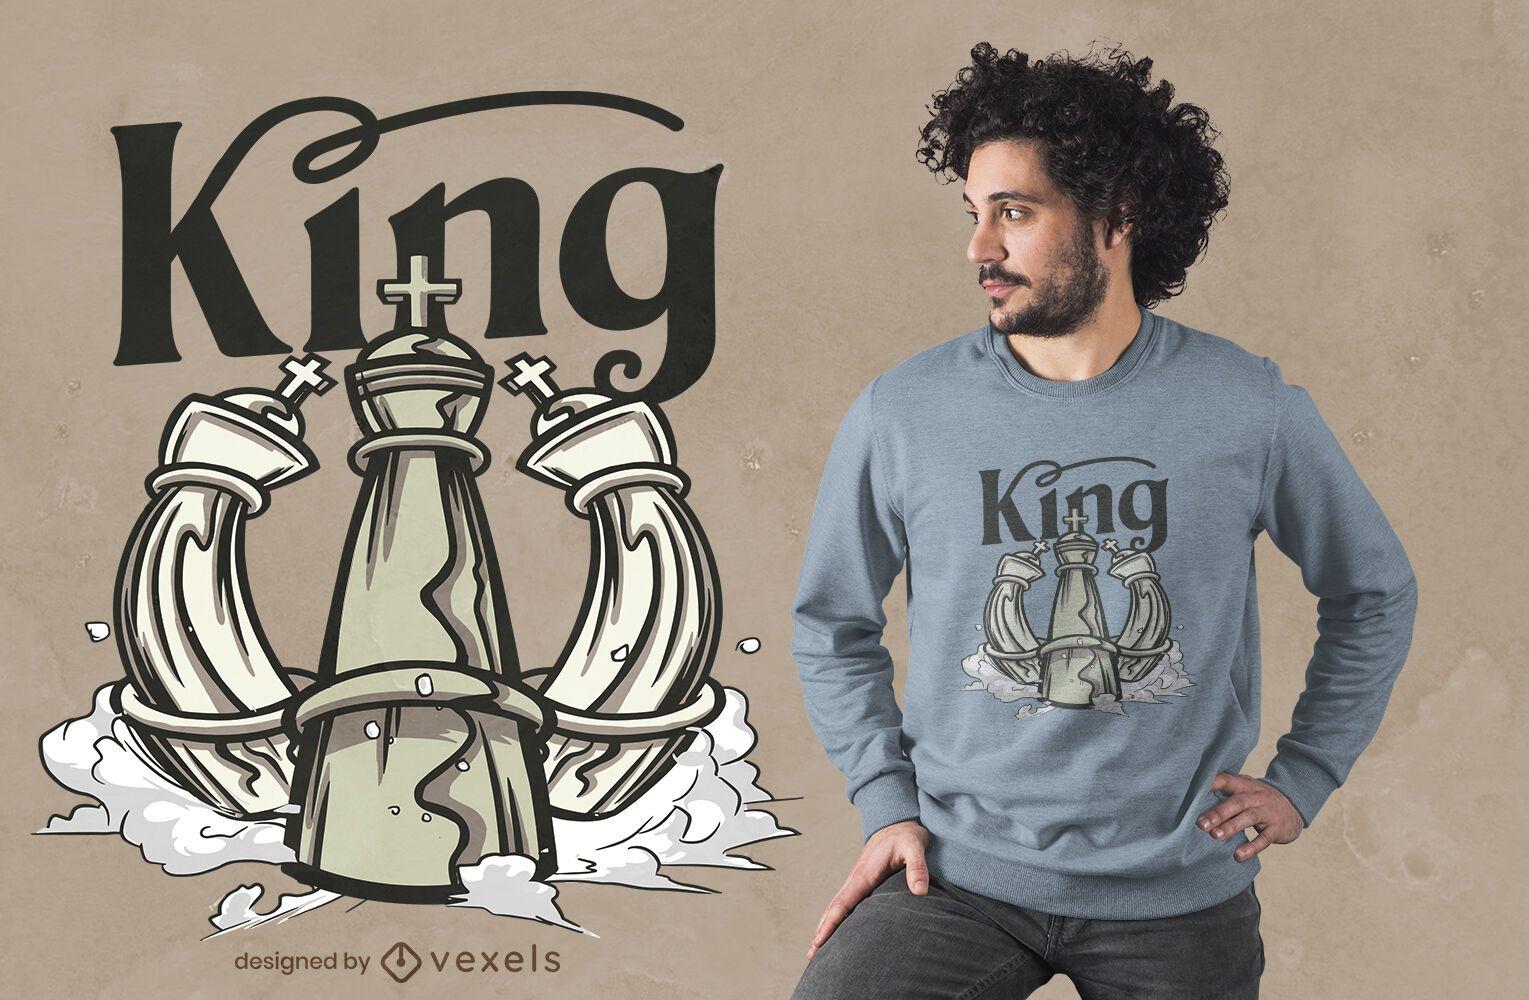 Chess king t-shirt design